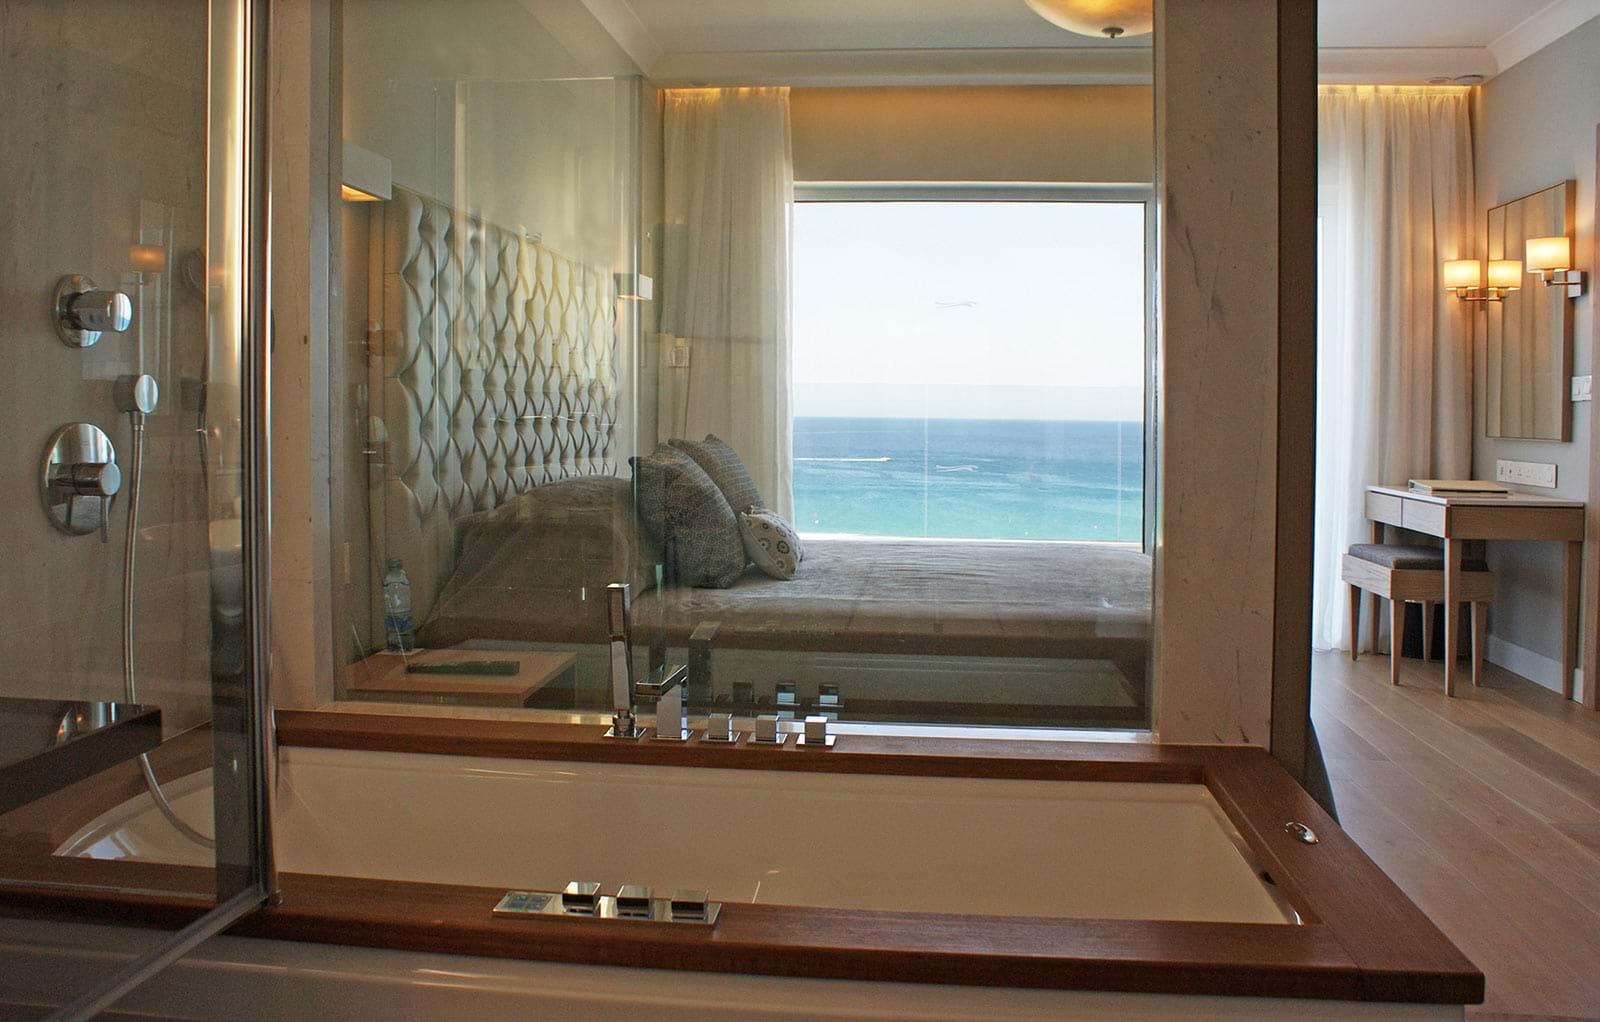 Rooms and Suites - Sunrise Pearl Hotel & Spa - Protaras - Cyprus